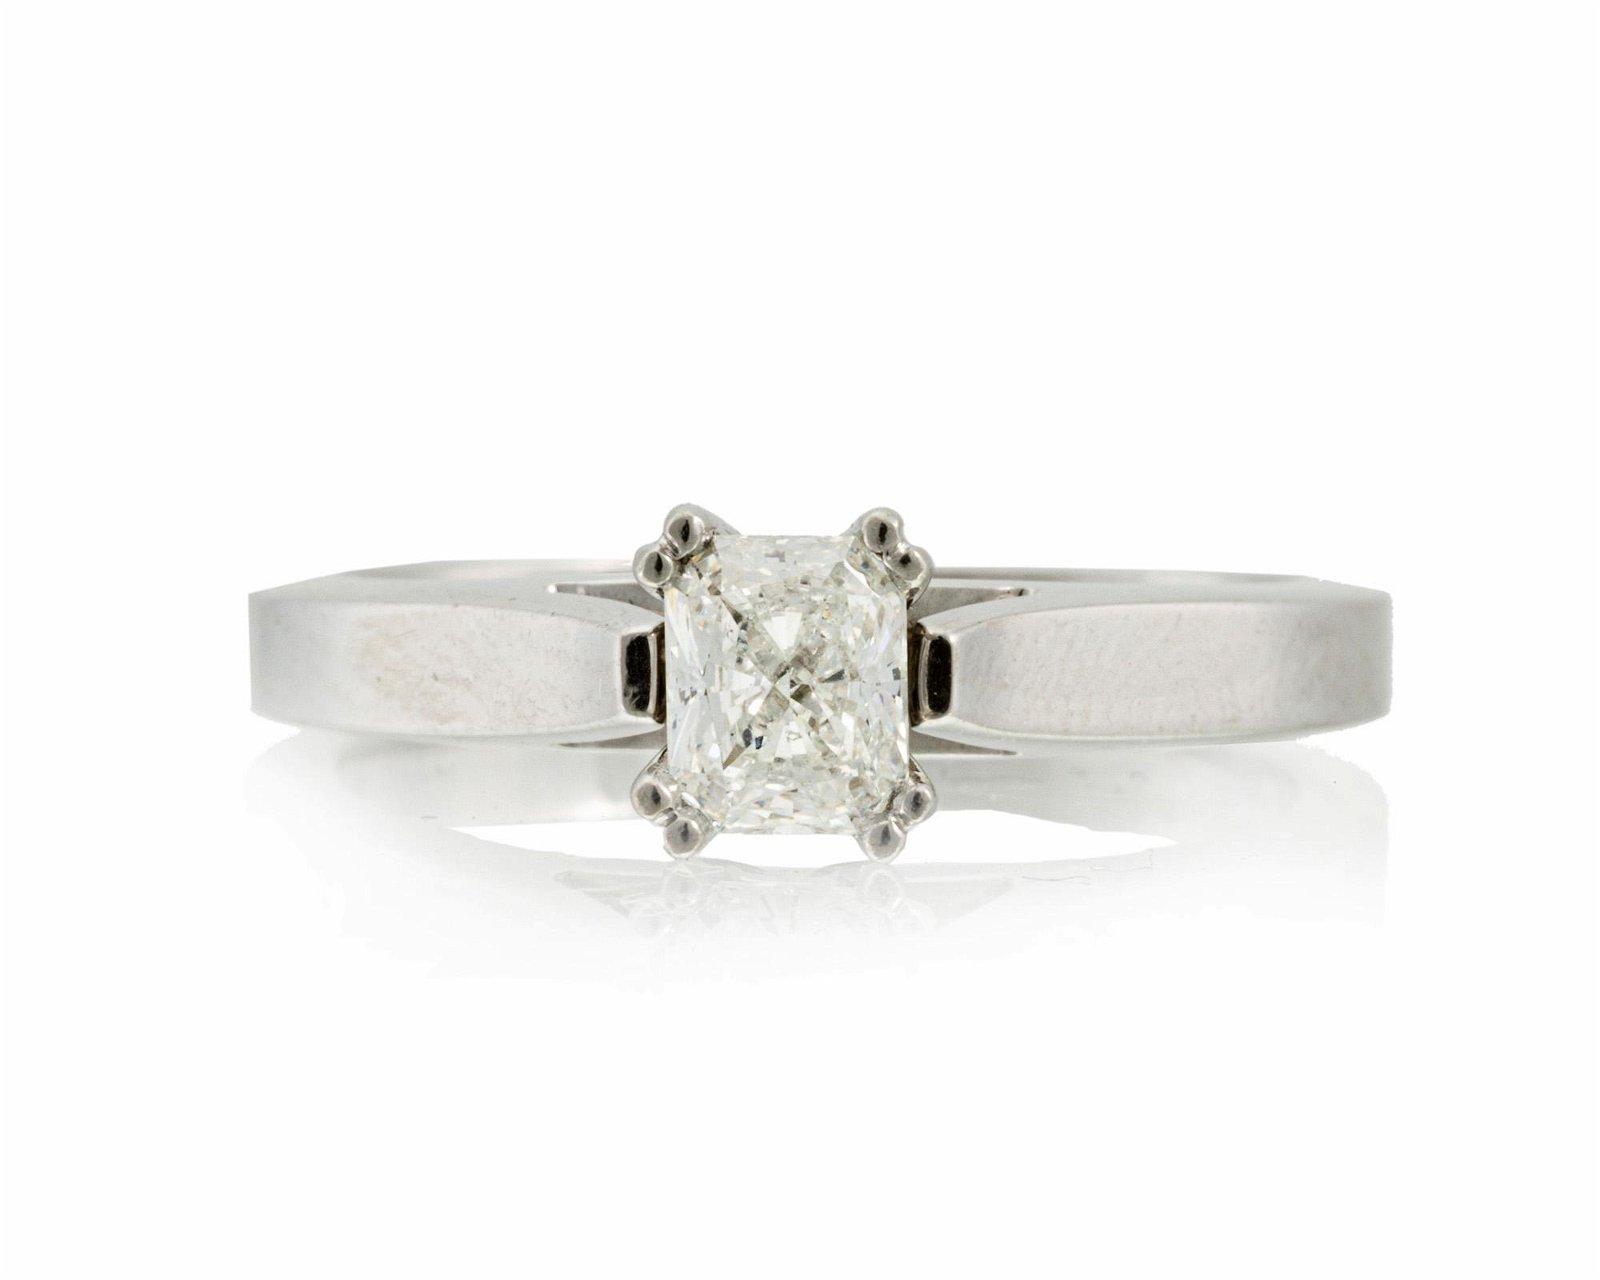 A radiant-cut diamond ring